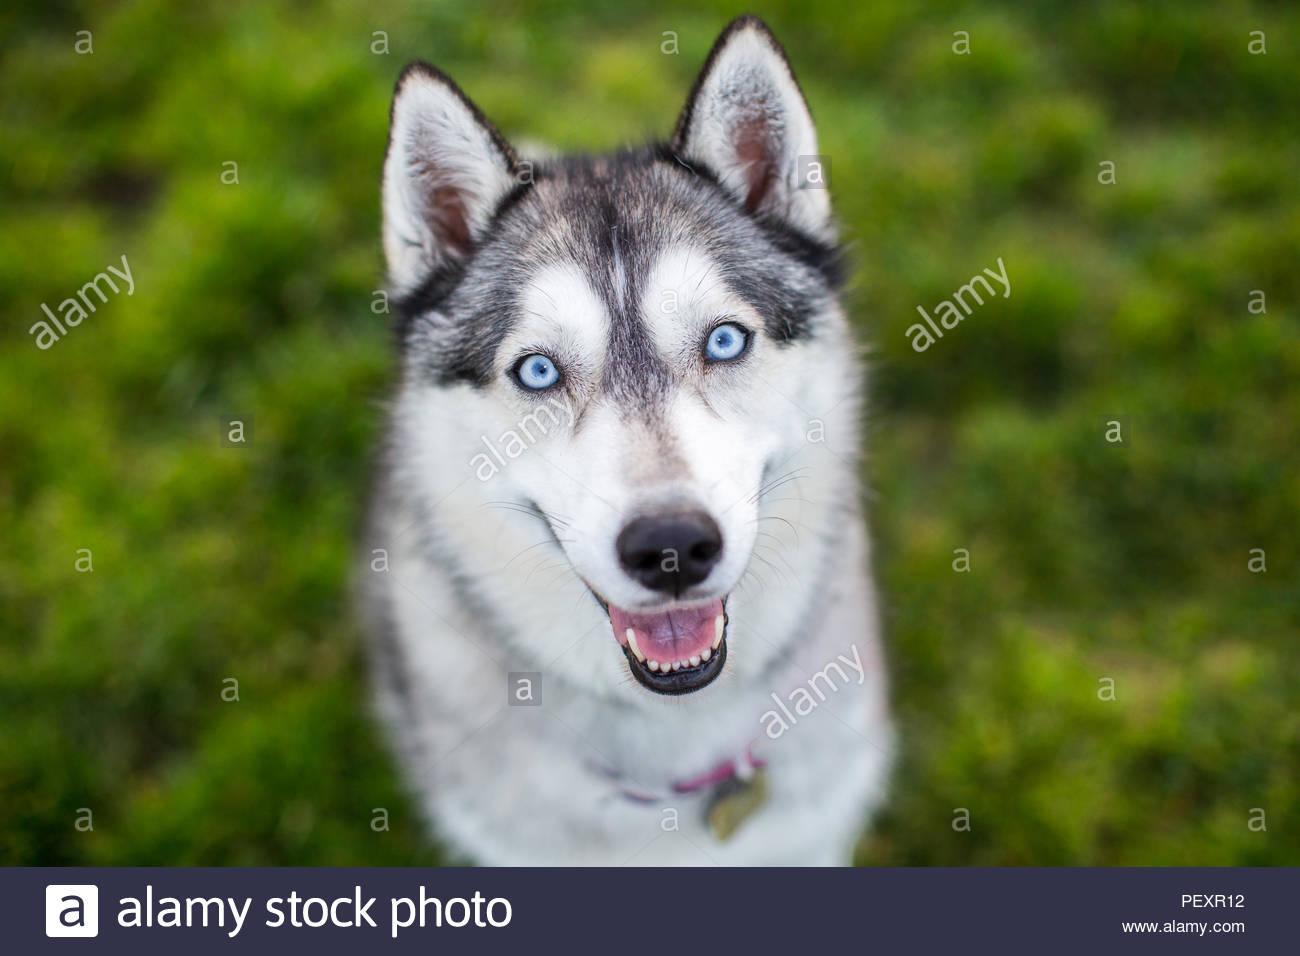 Smiling Siberian Husky with Blue Eyes Close-up Portait - Stock Image